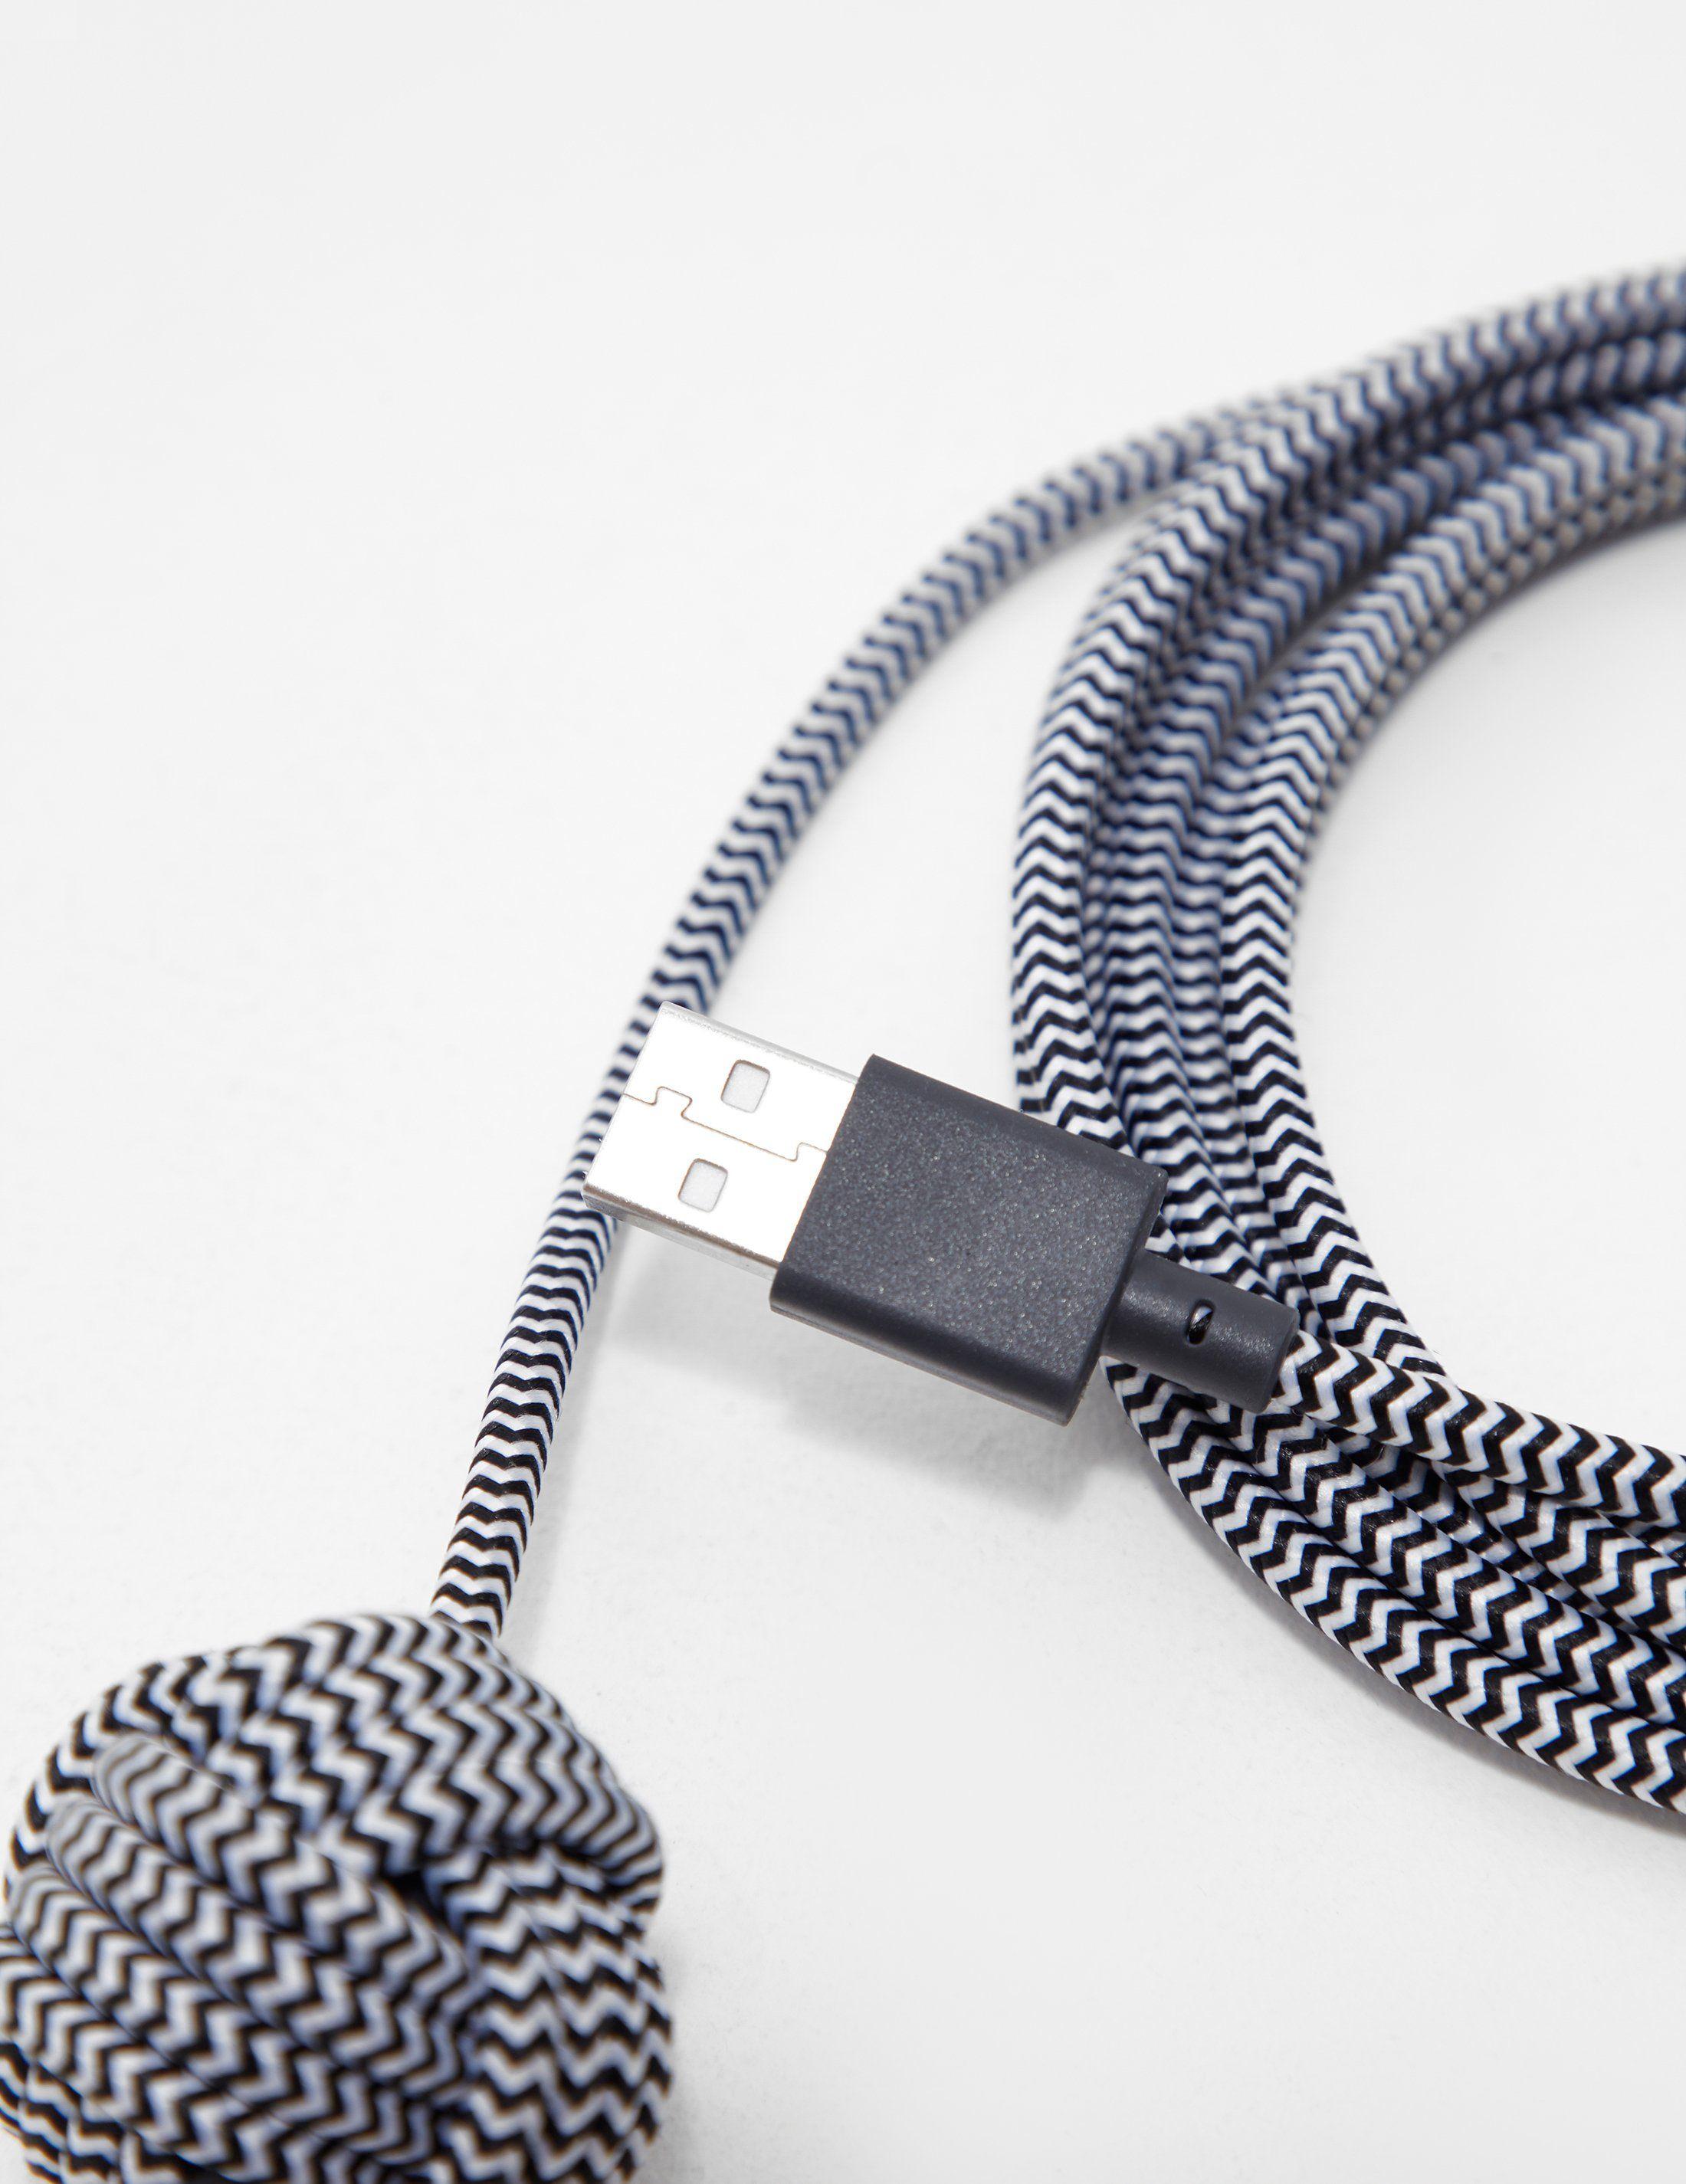 Native Union Night Lightning Cable